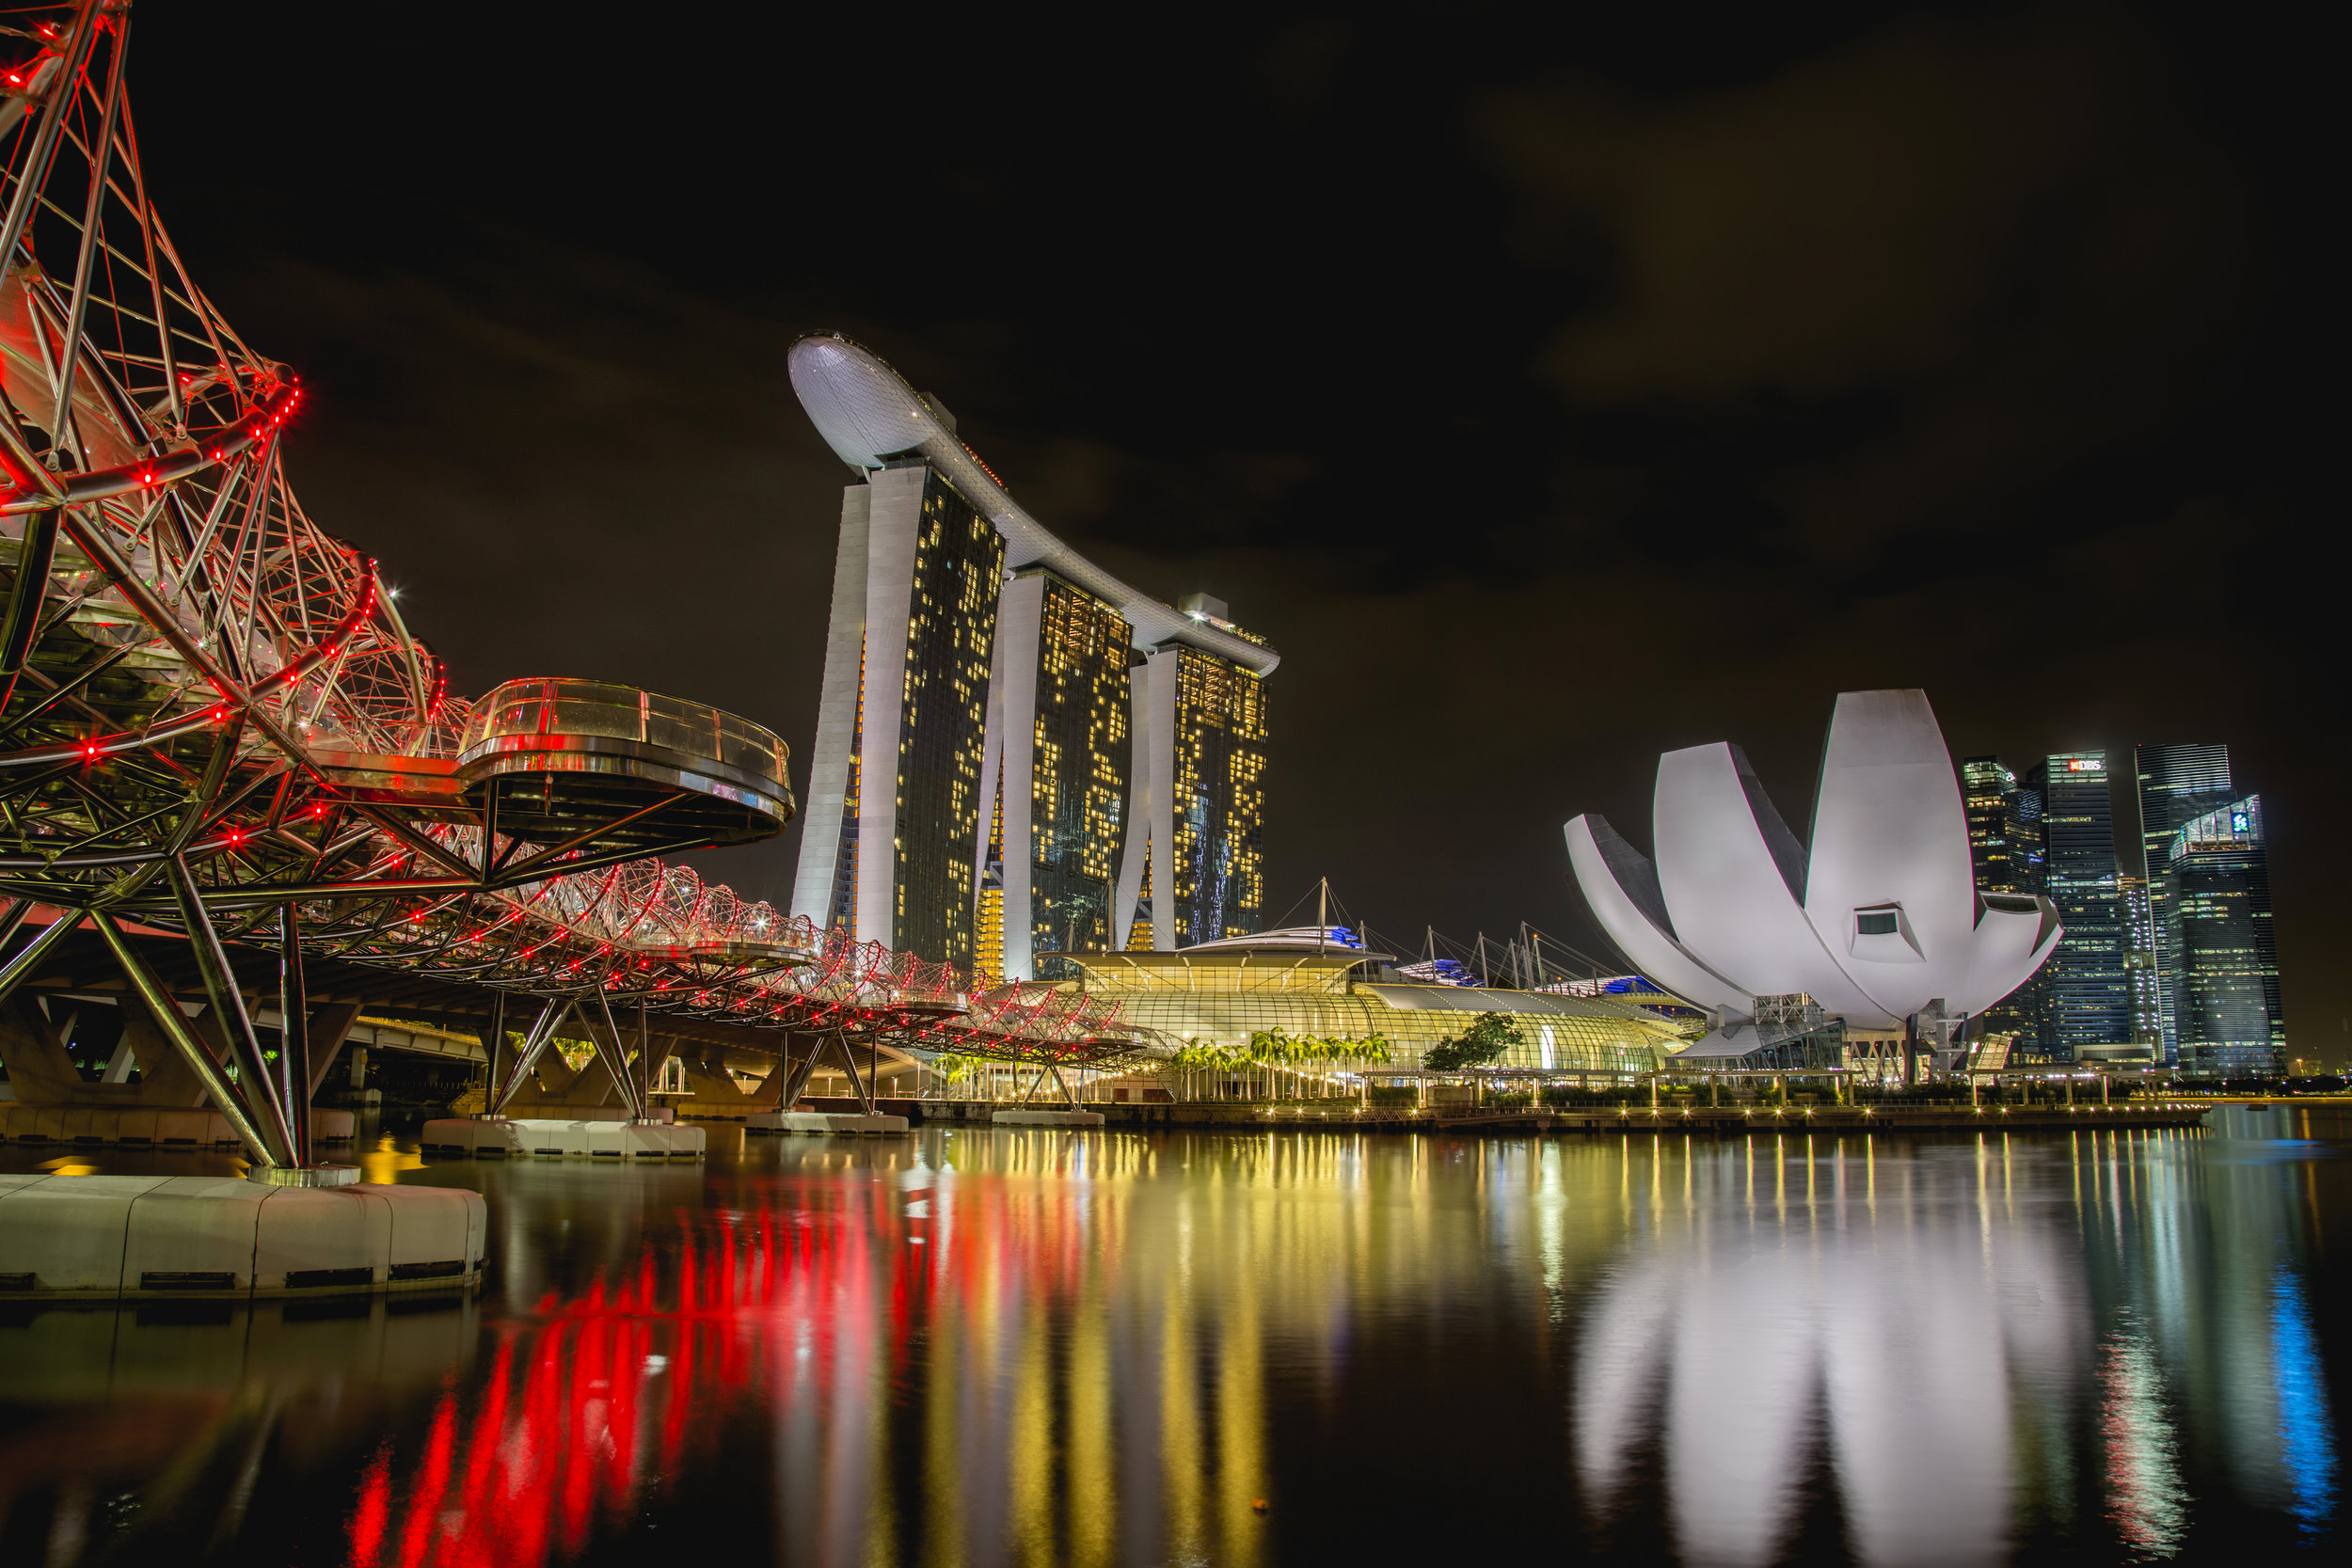 Singapore Travel Guide - Let's Go Bravo - Eric Bravo Photography